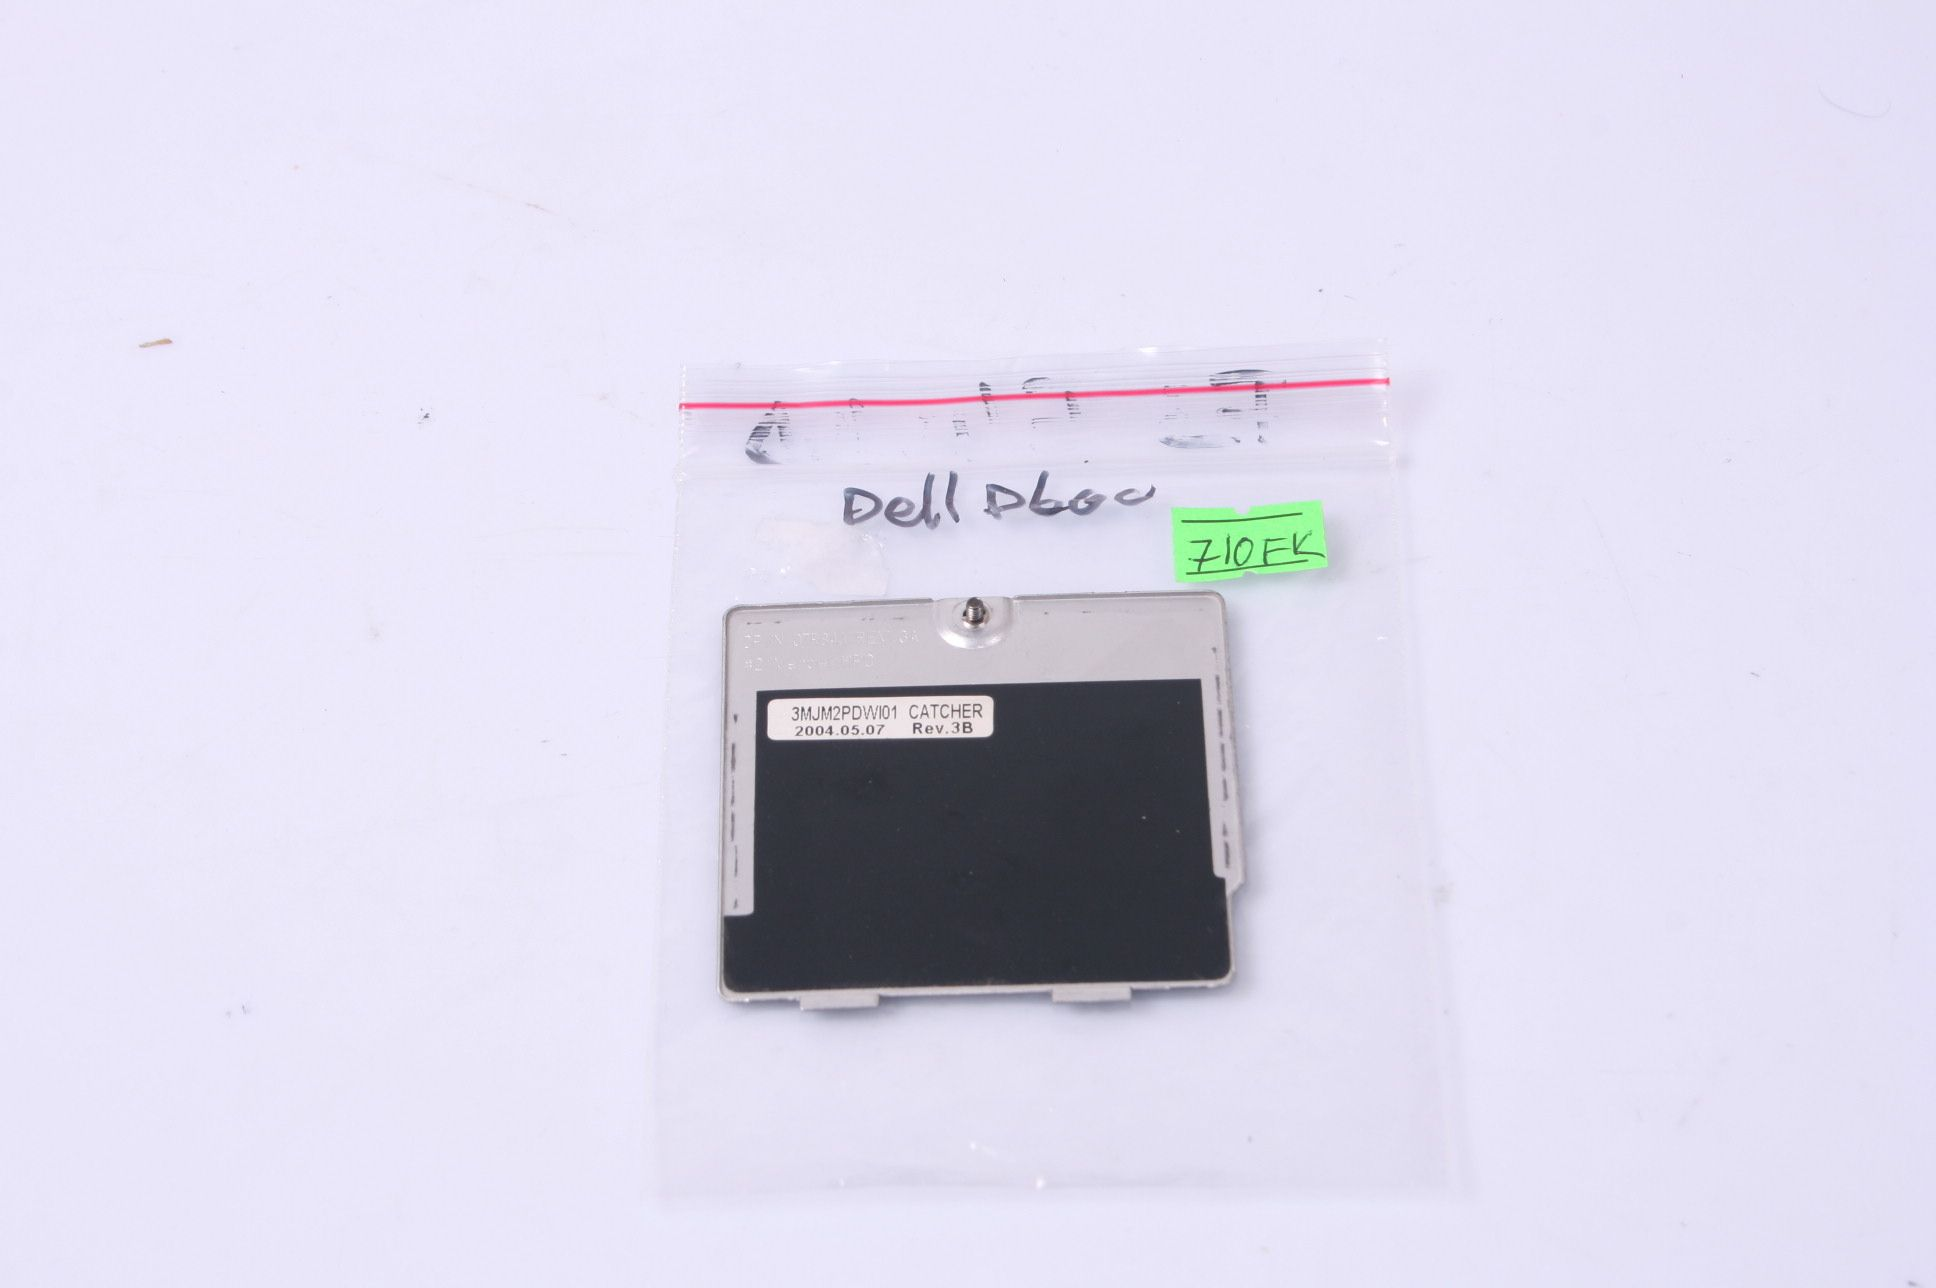 Dell Latitude D600 Memory Cover 3LJM2RDWI01 07R843